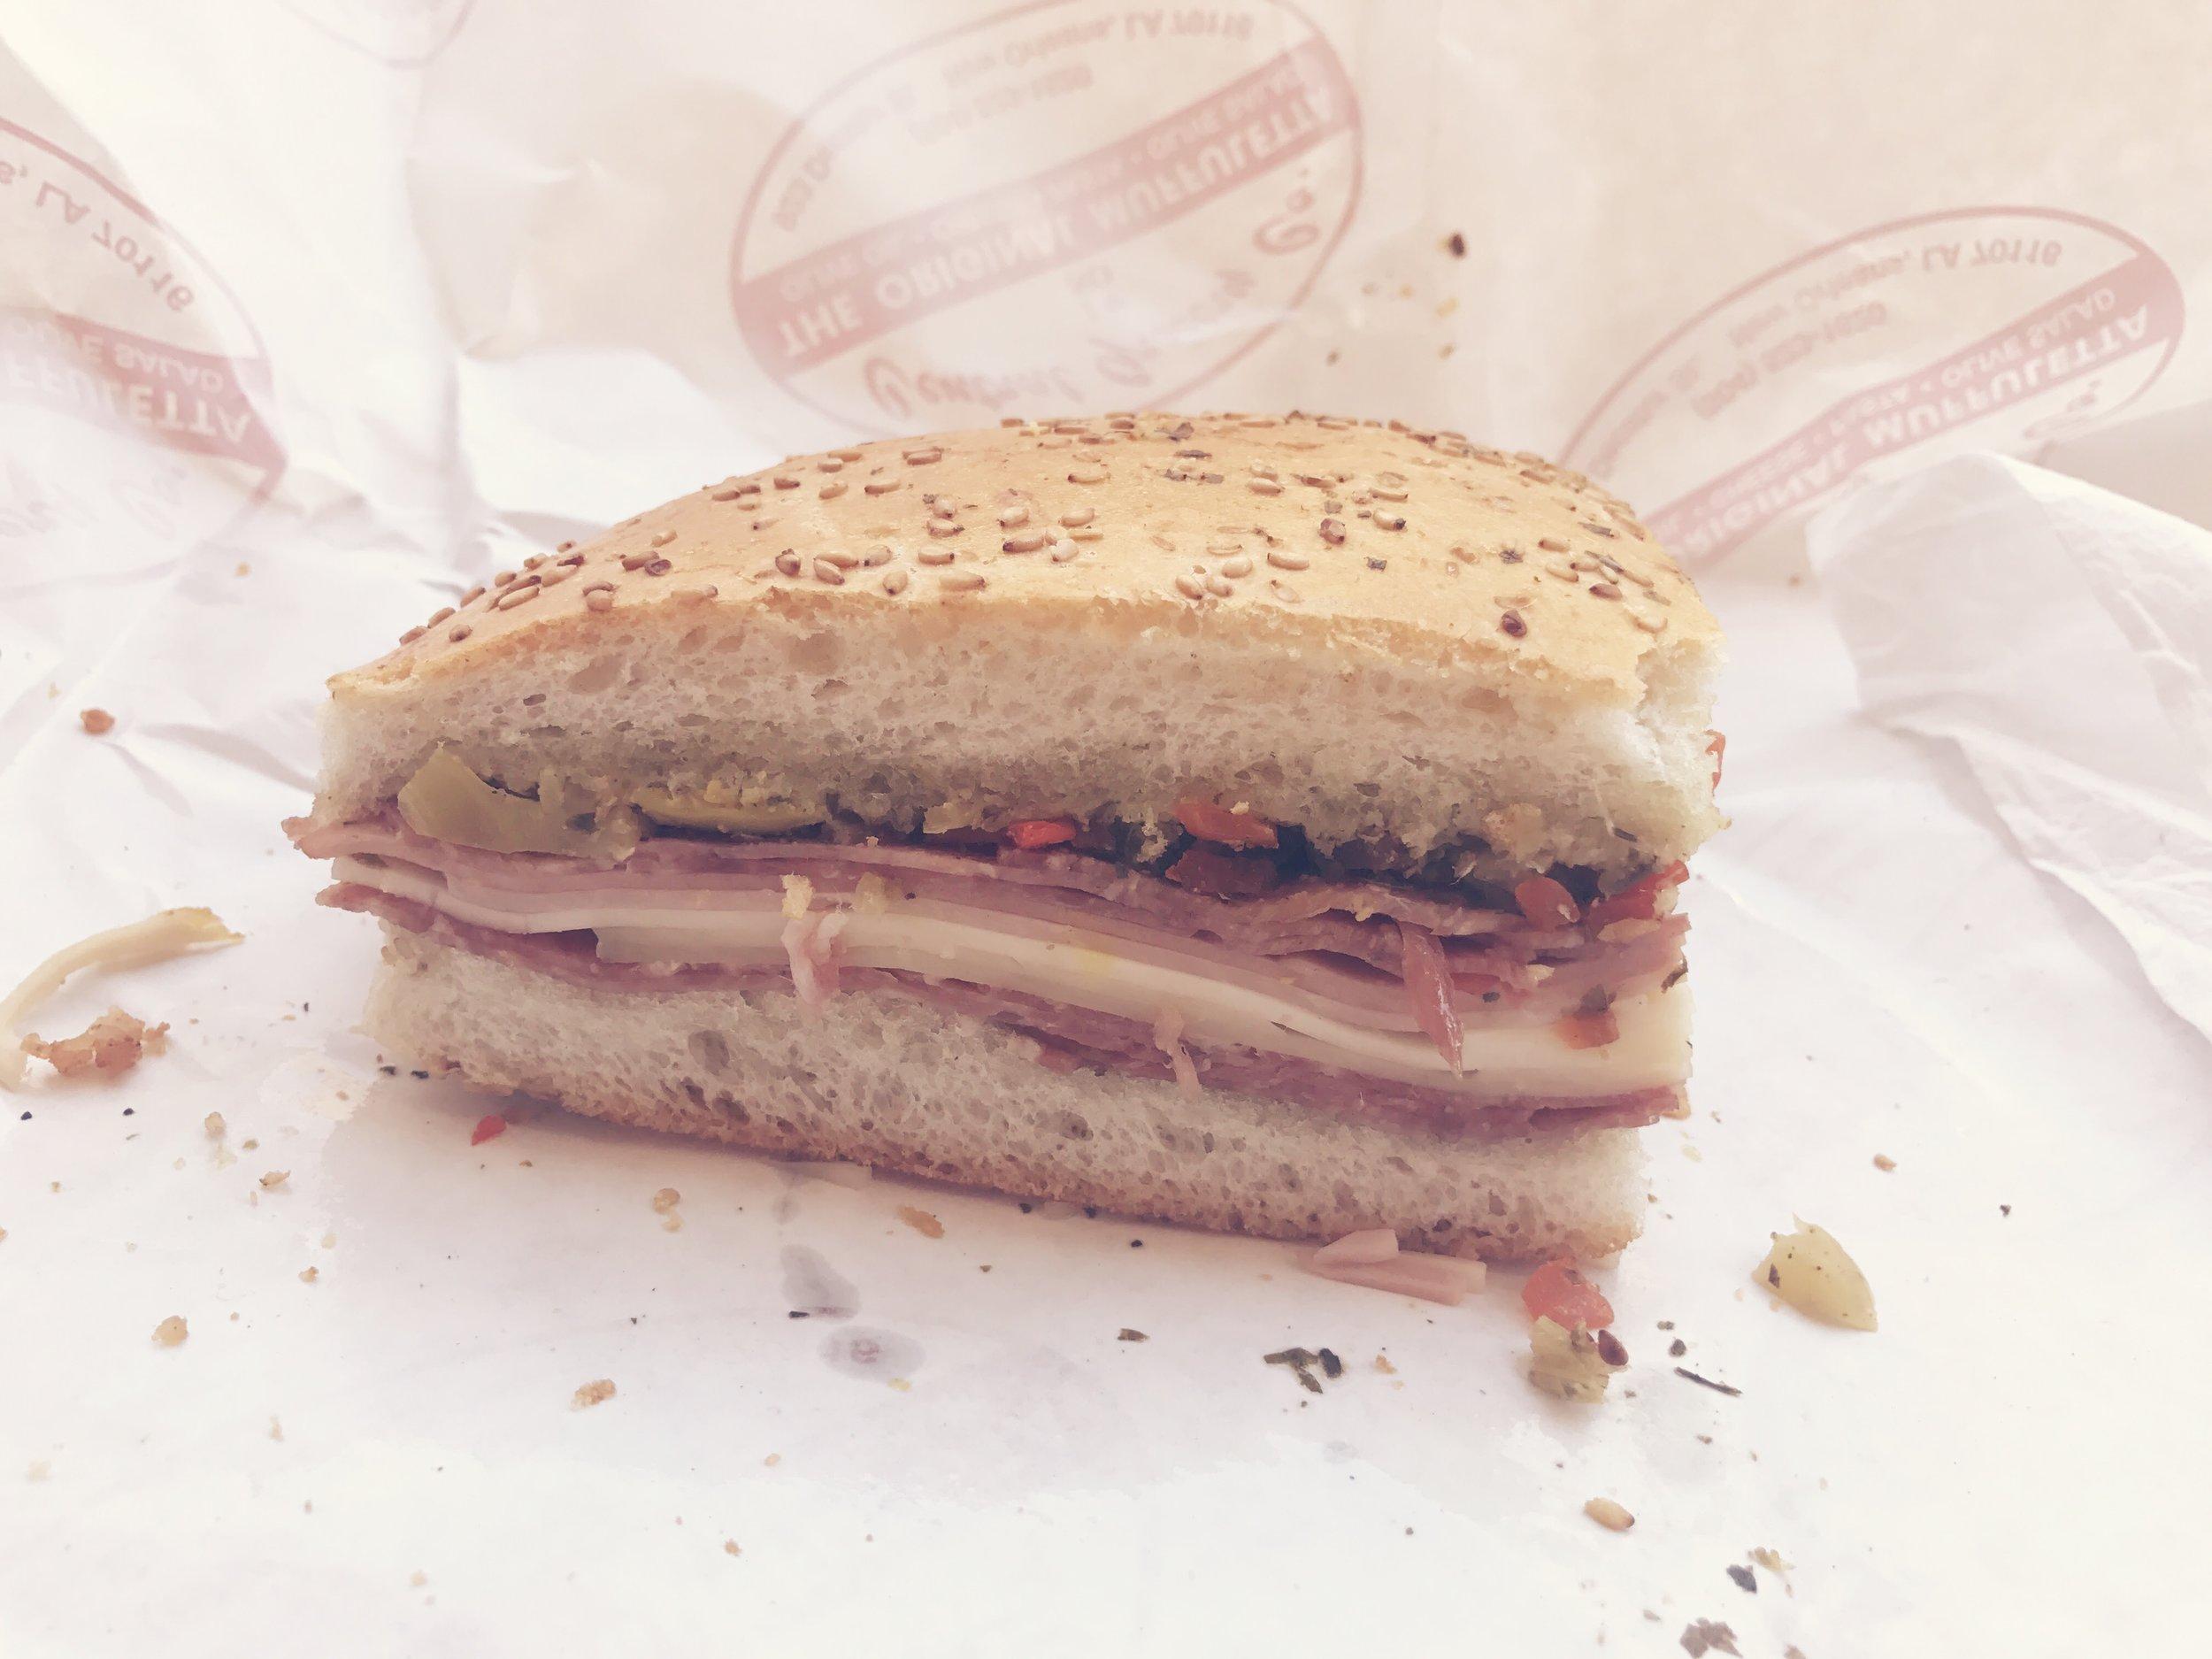 Courtney's muffuletta sandwich - the olives!